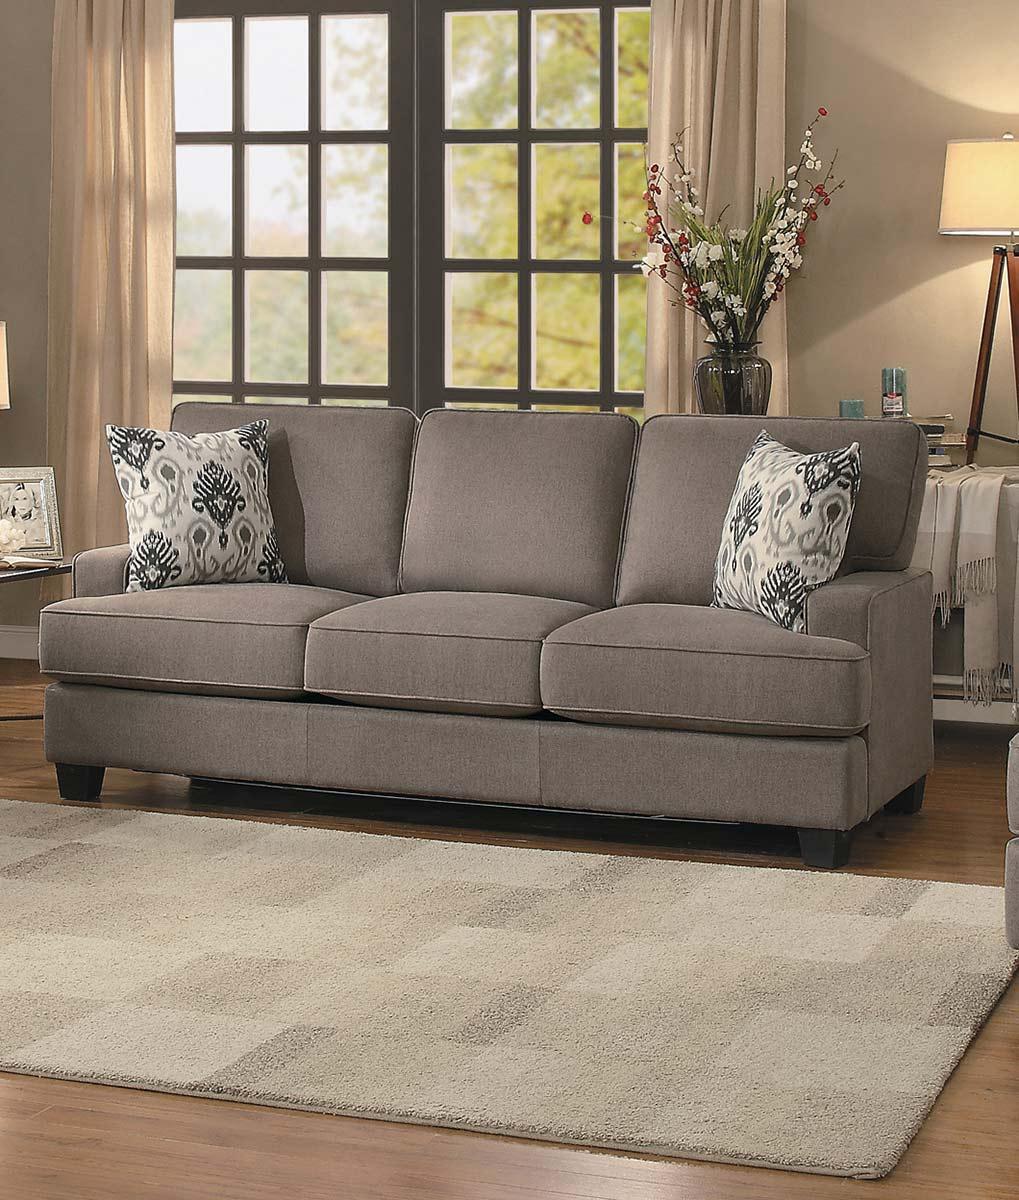 Homelegance Kenner Sofa - Brown Fabric